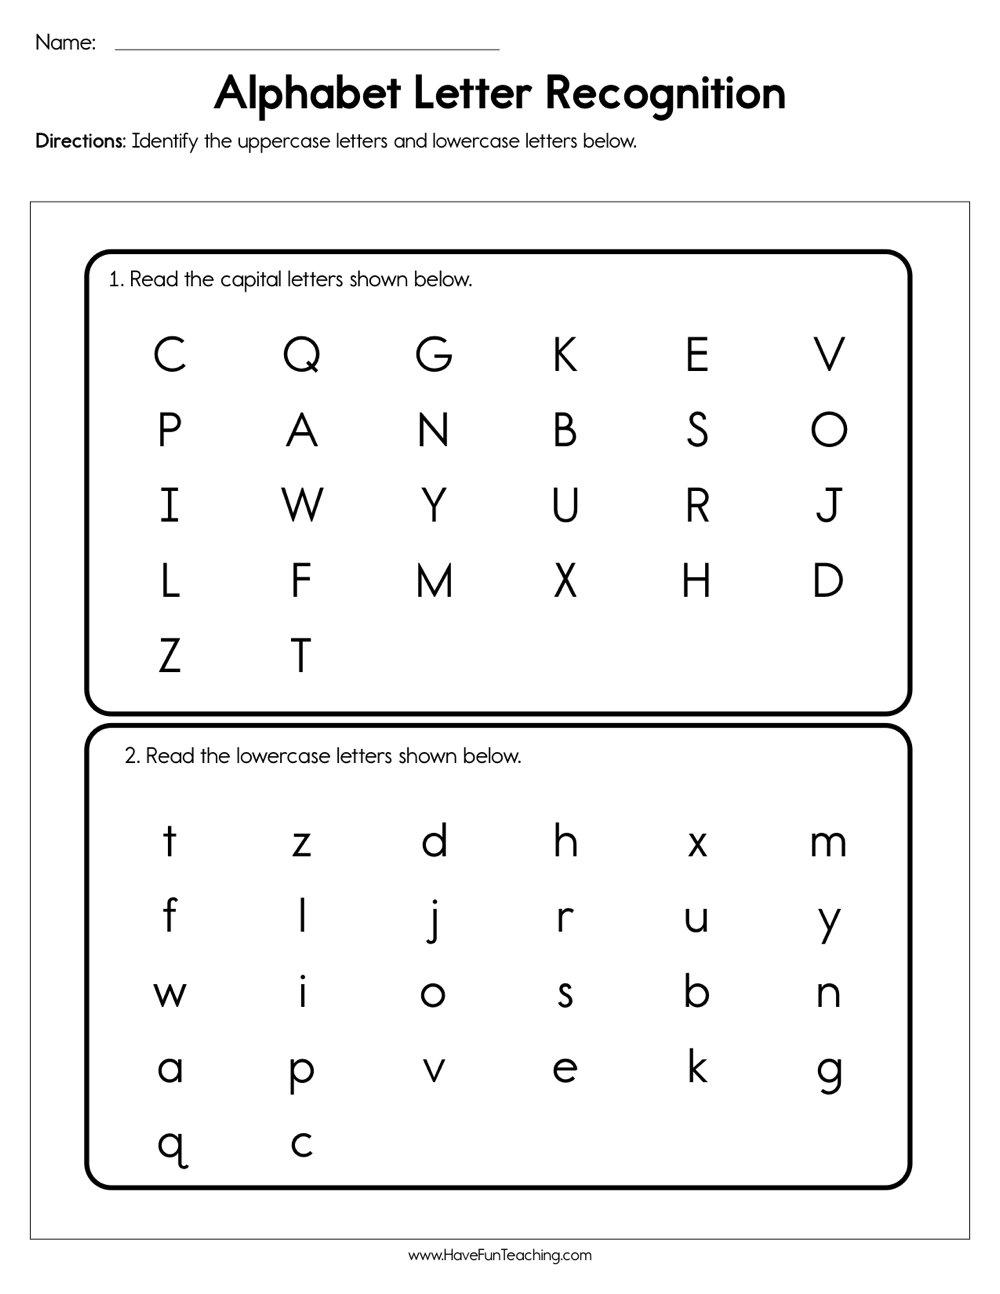 Alphabet Letter Recognition Assessment Have Fun Teaching regarding Alphabet Review Worksheets For First Grade